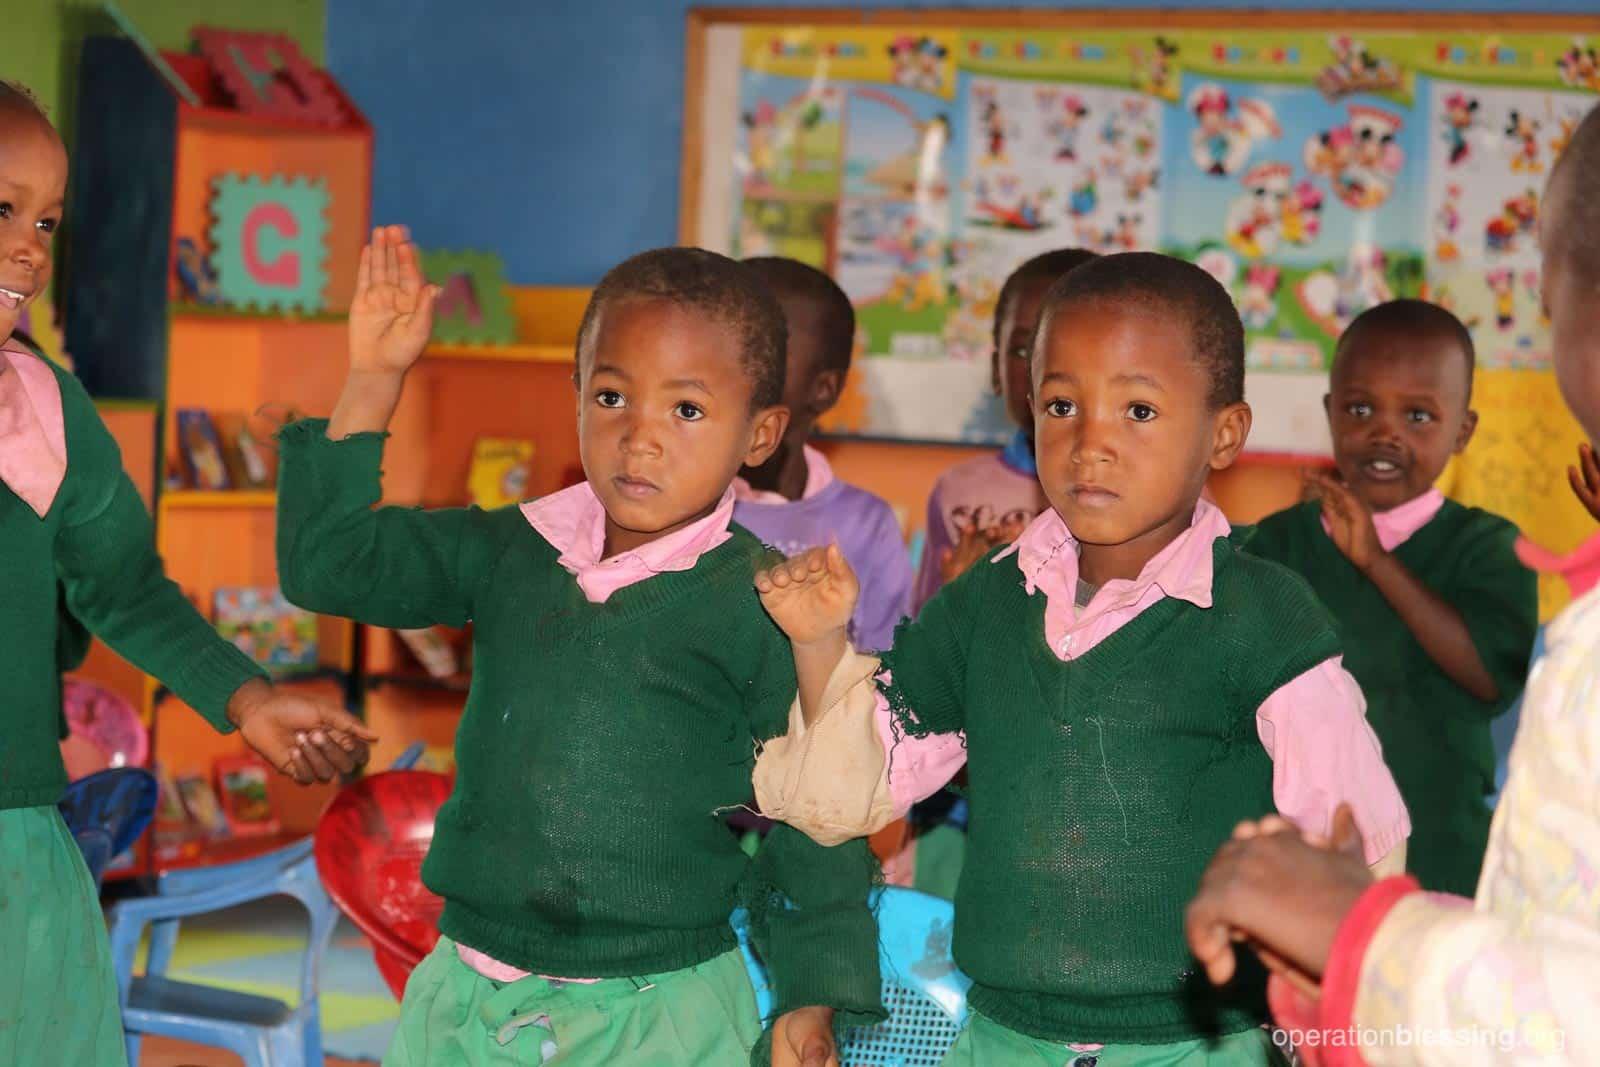 The twins in class in Kenya.